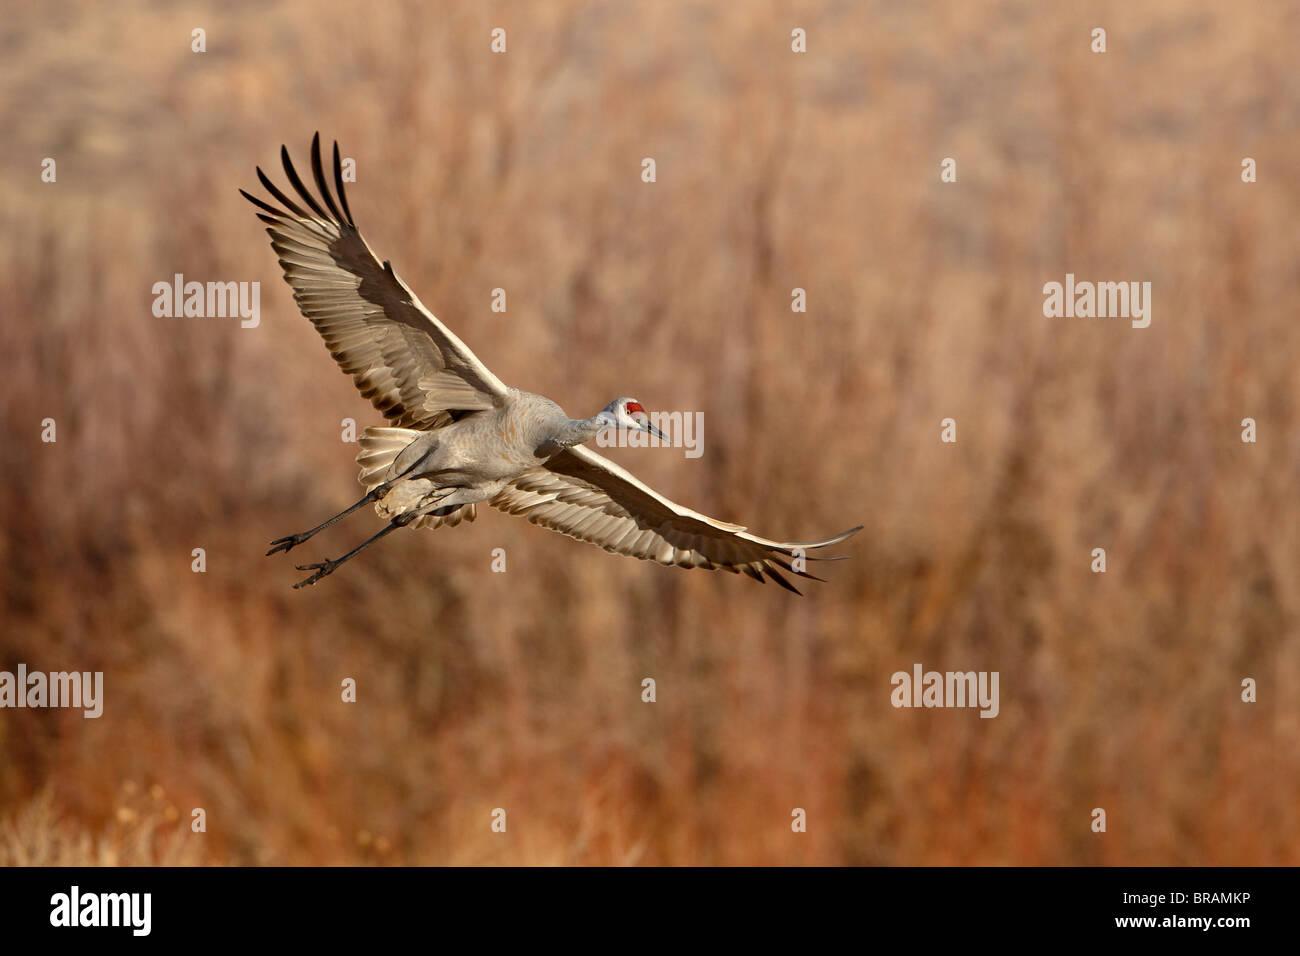 Grue du Canada (Grus canadensis) à peu près à la terre, Bernardo de faune, Ladd S. Gordon complexe Photo Stock